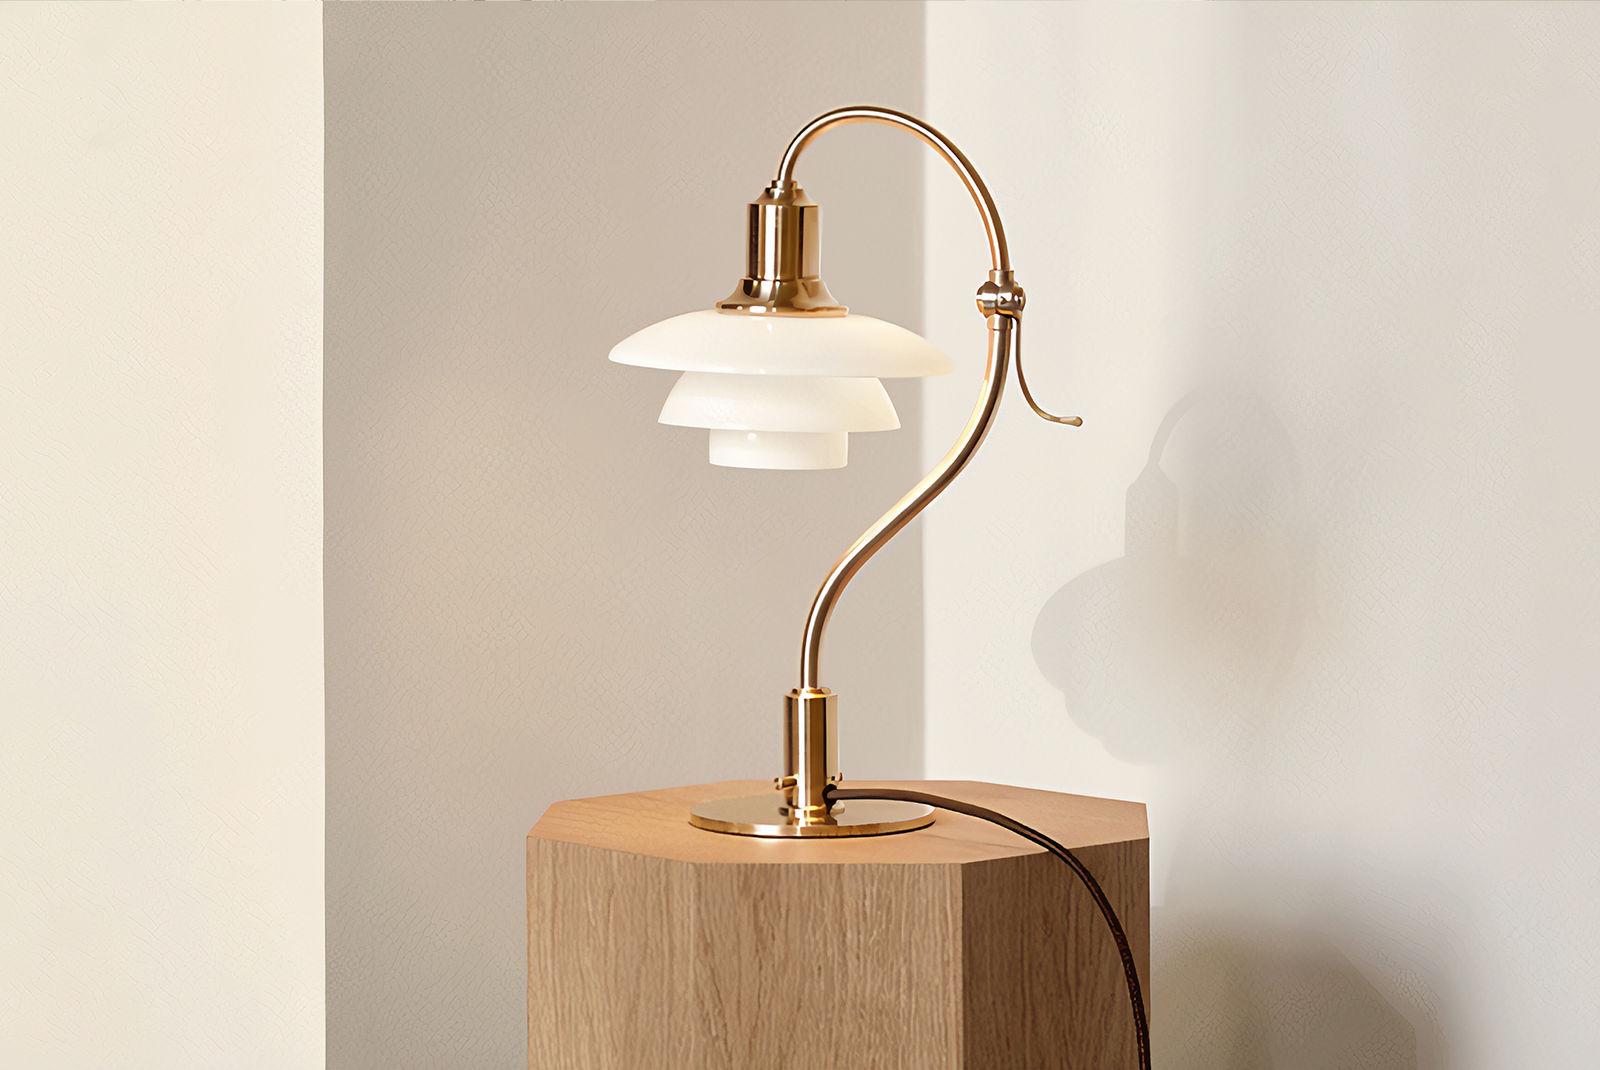 PH Artichoke designed by Poul Henningsen